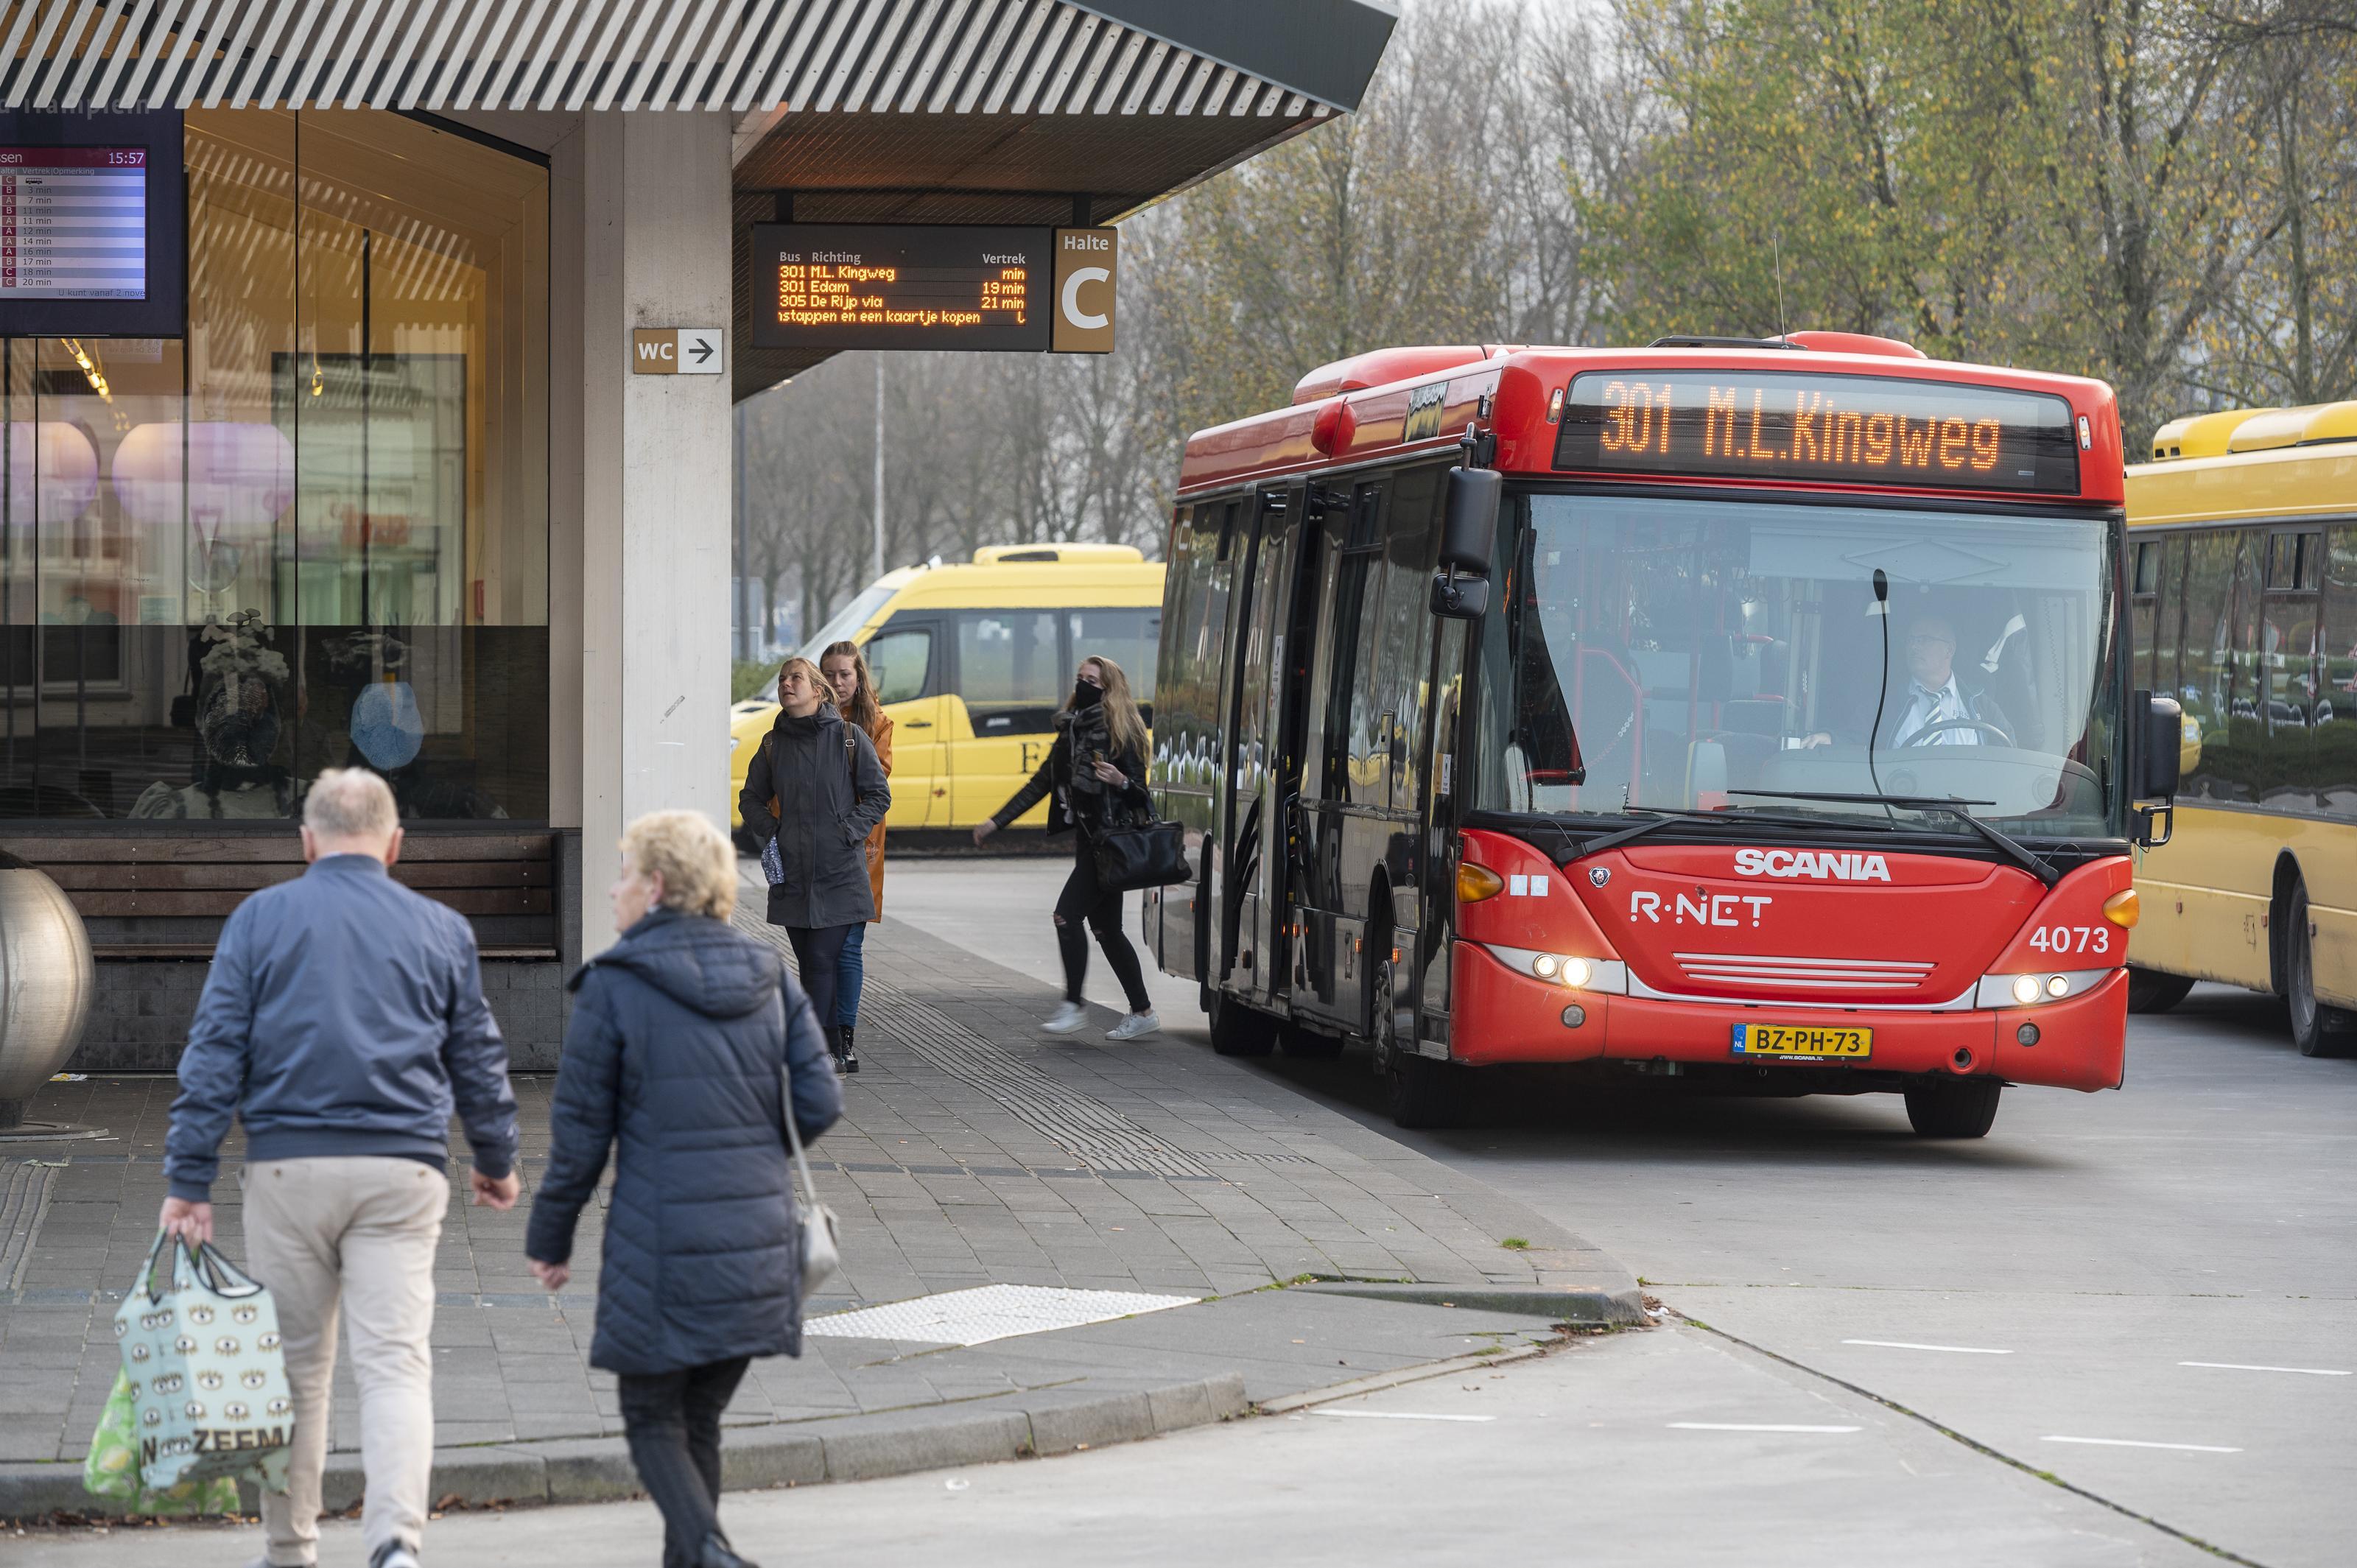 Mes in spitsbussen en speciale buslijnen in Zaanstreek-Waterland. Minder forenzen en toeristen